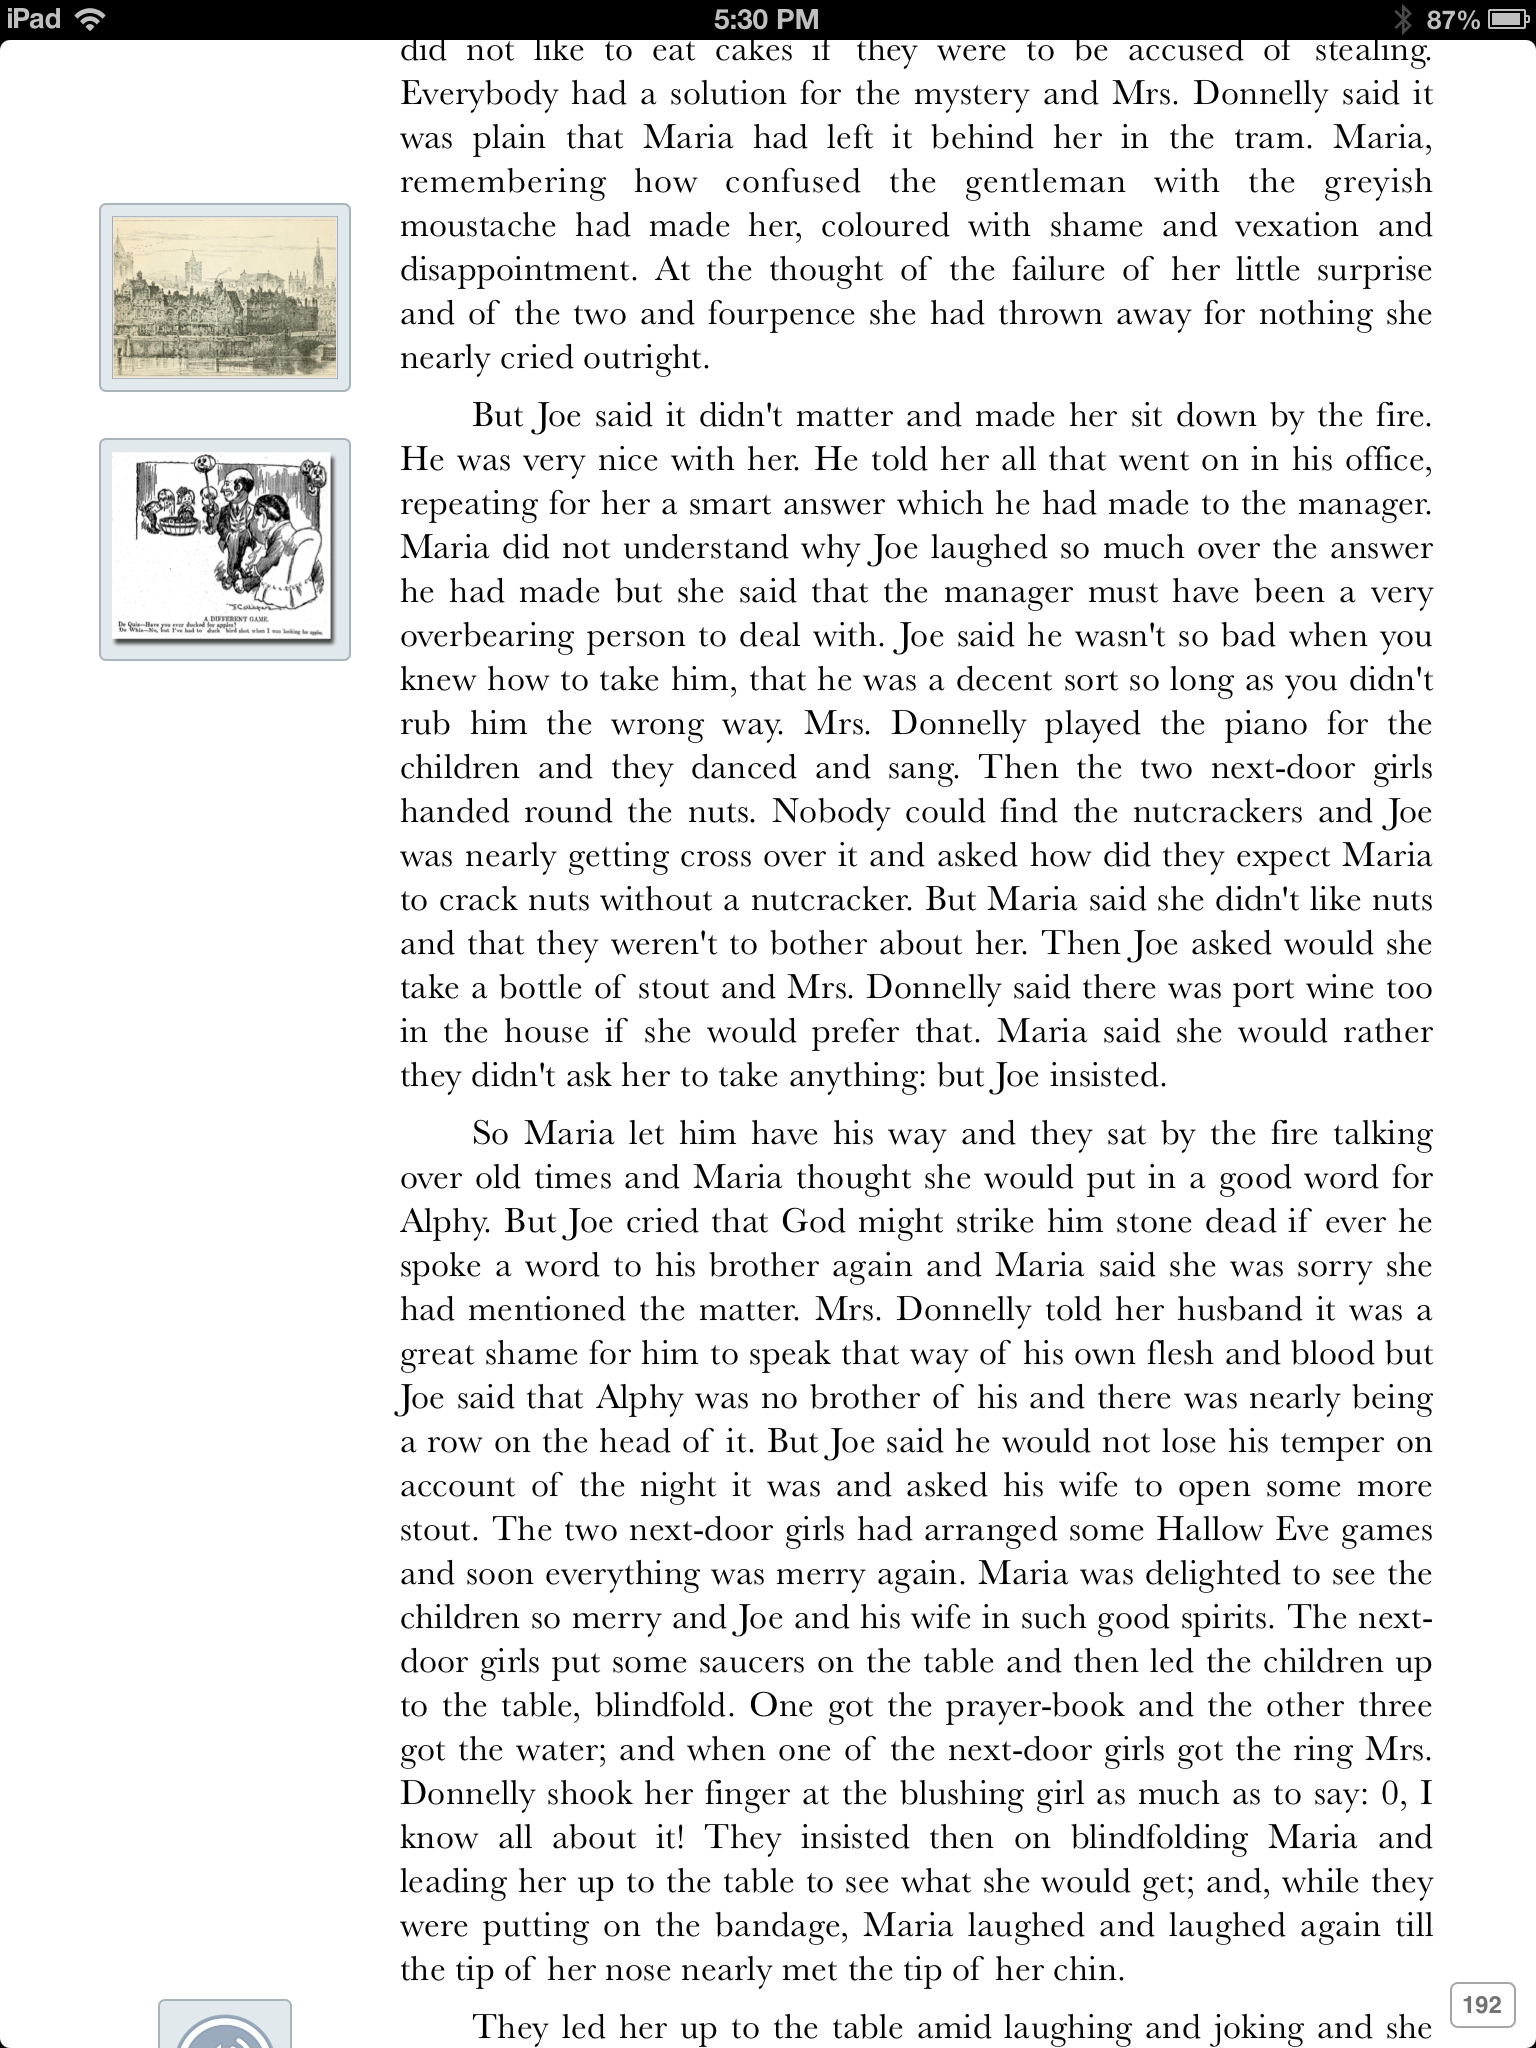 critical essays dubliners James augustine aloysius joyce, noto semplicemente come james joyce (dublino, 2 james joyce s dubliners critical essays febbraio 1882 – zurigo, 13 gennaio 1941) è.